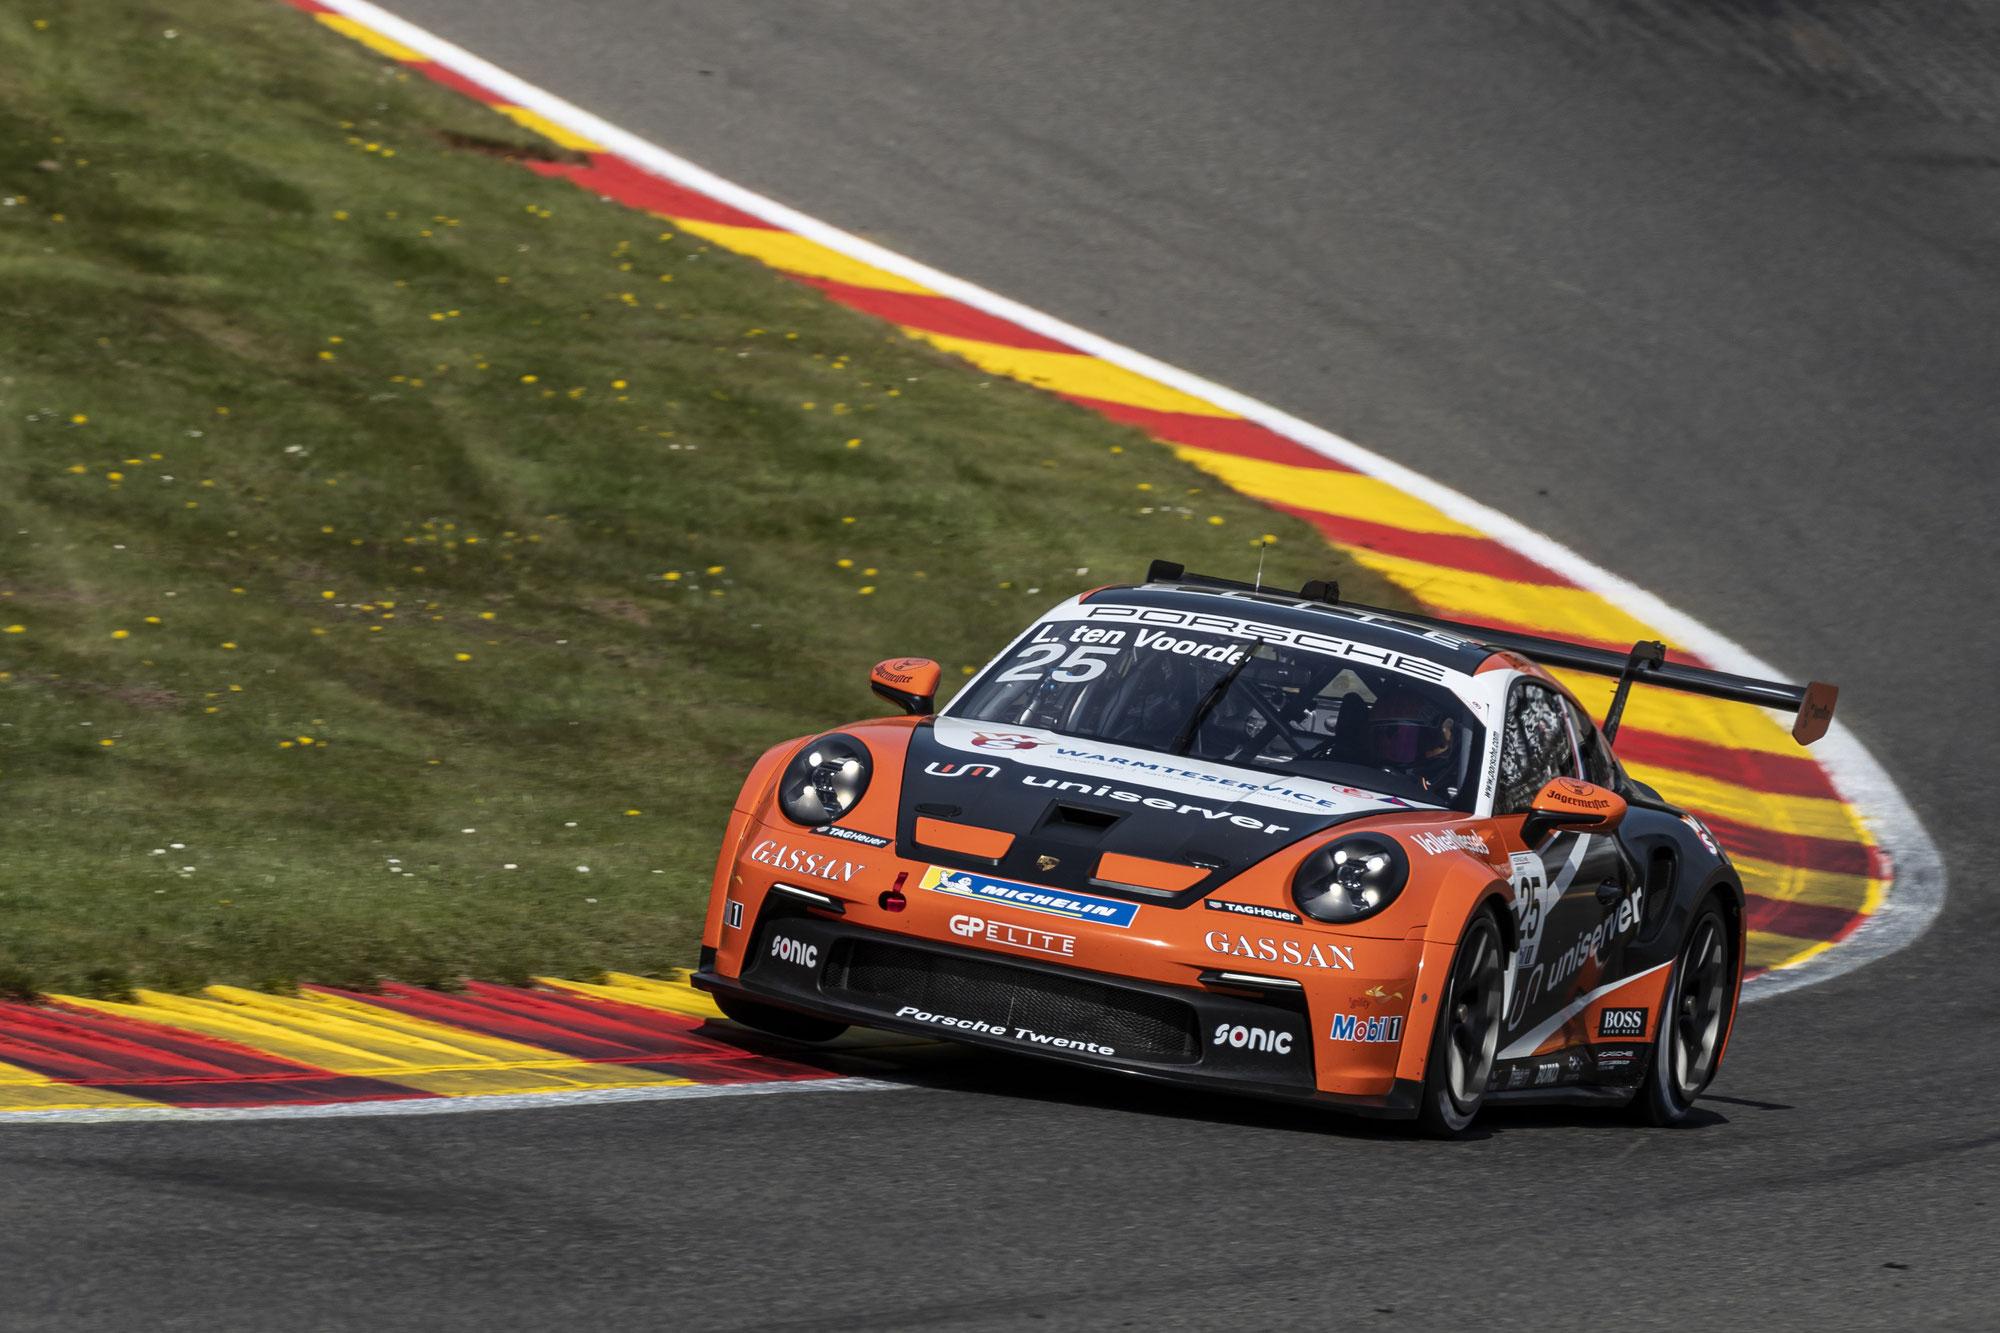 Porsche Mobil1 Supercup mit 32 Fahrzeugen zu Gast in Spa-Francorchamps